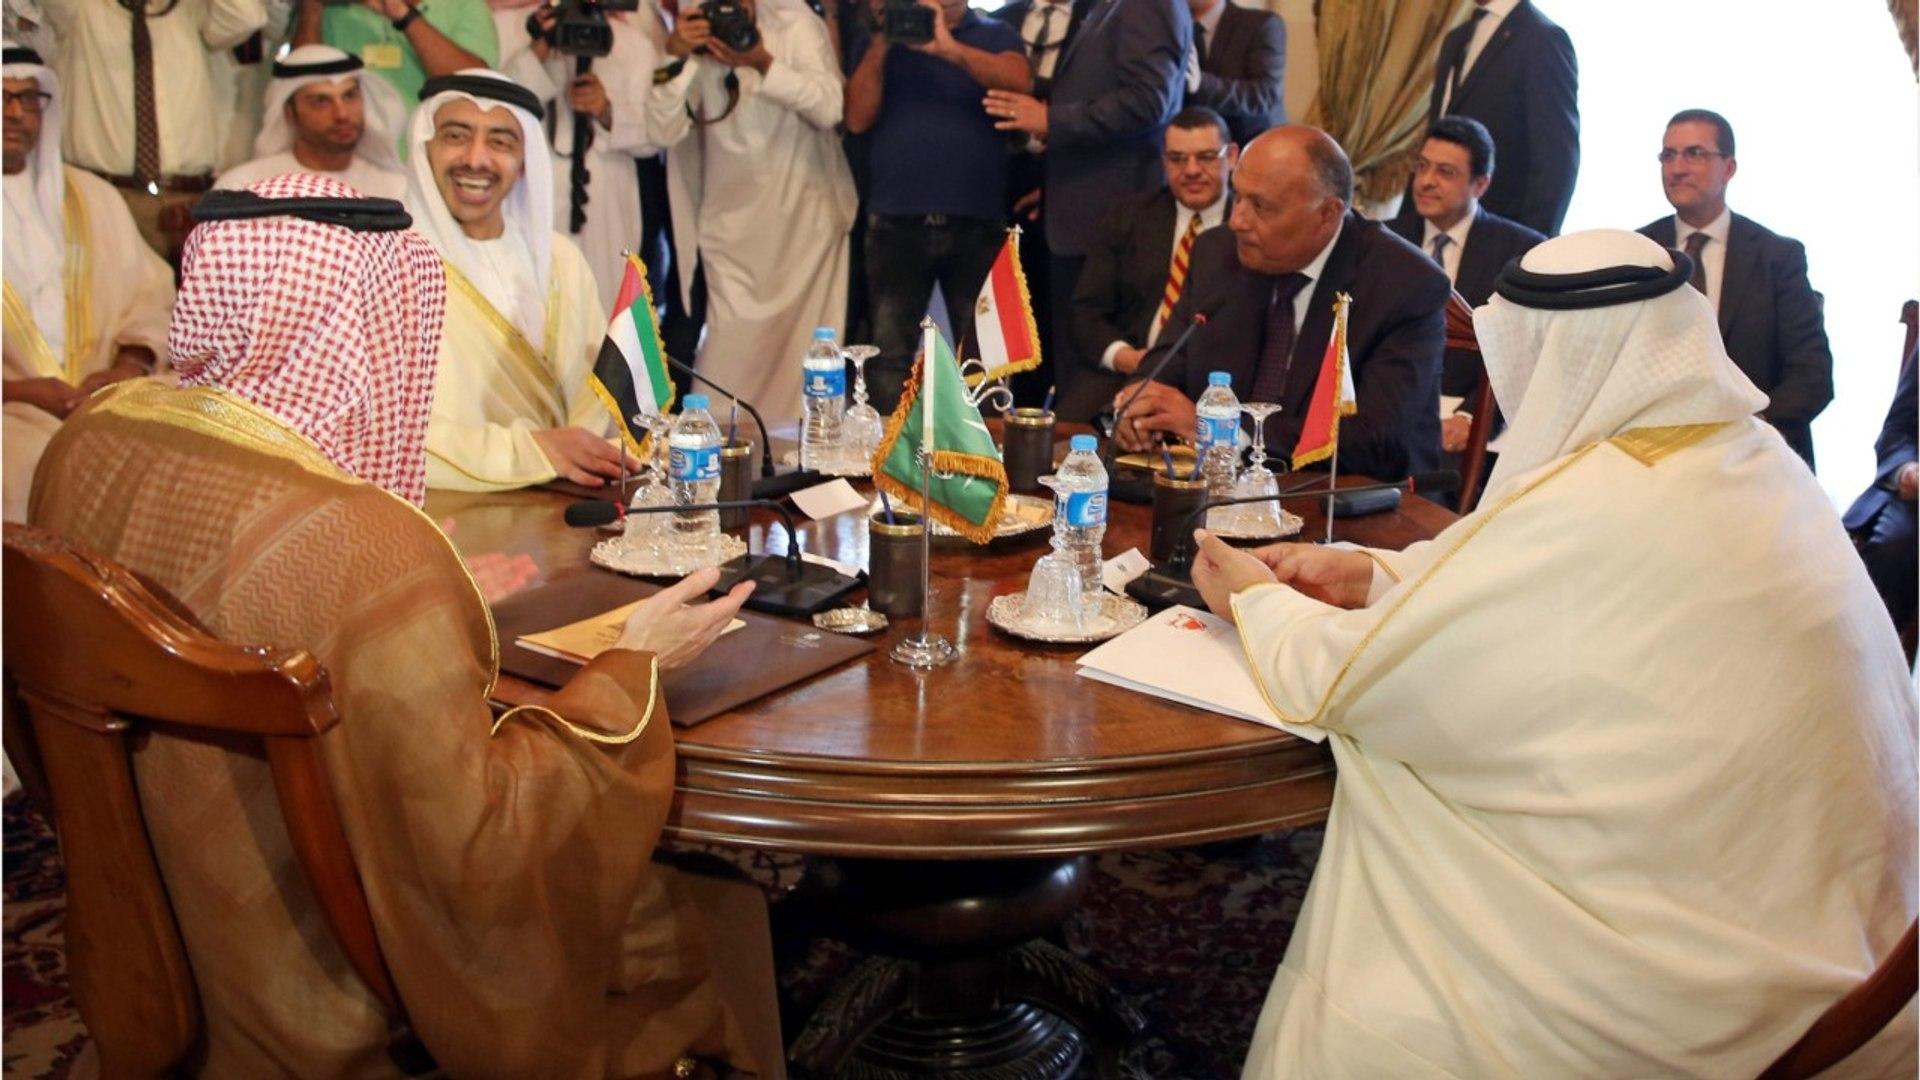 Qatar's US Ambassador: We Can Live Under Arab Embargo 'Forever'